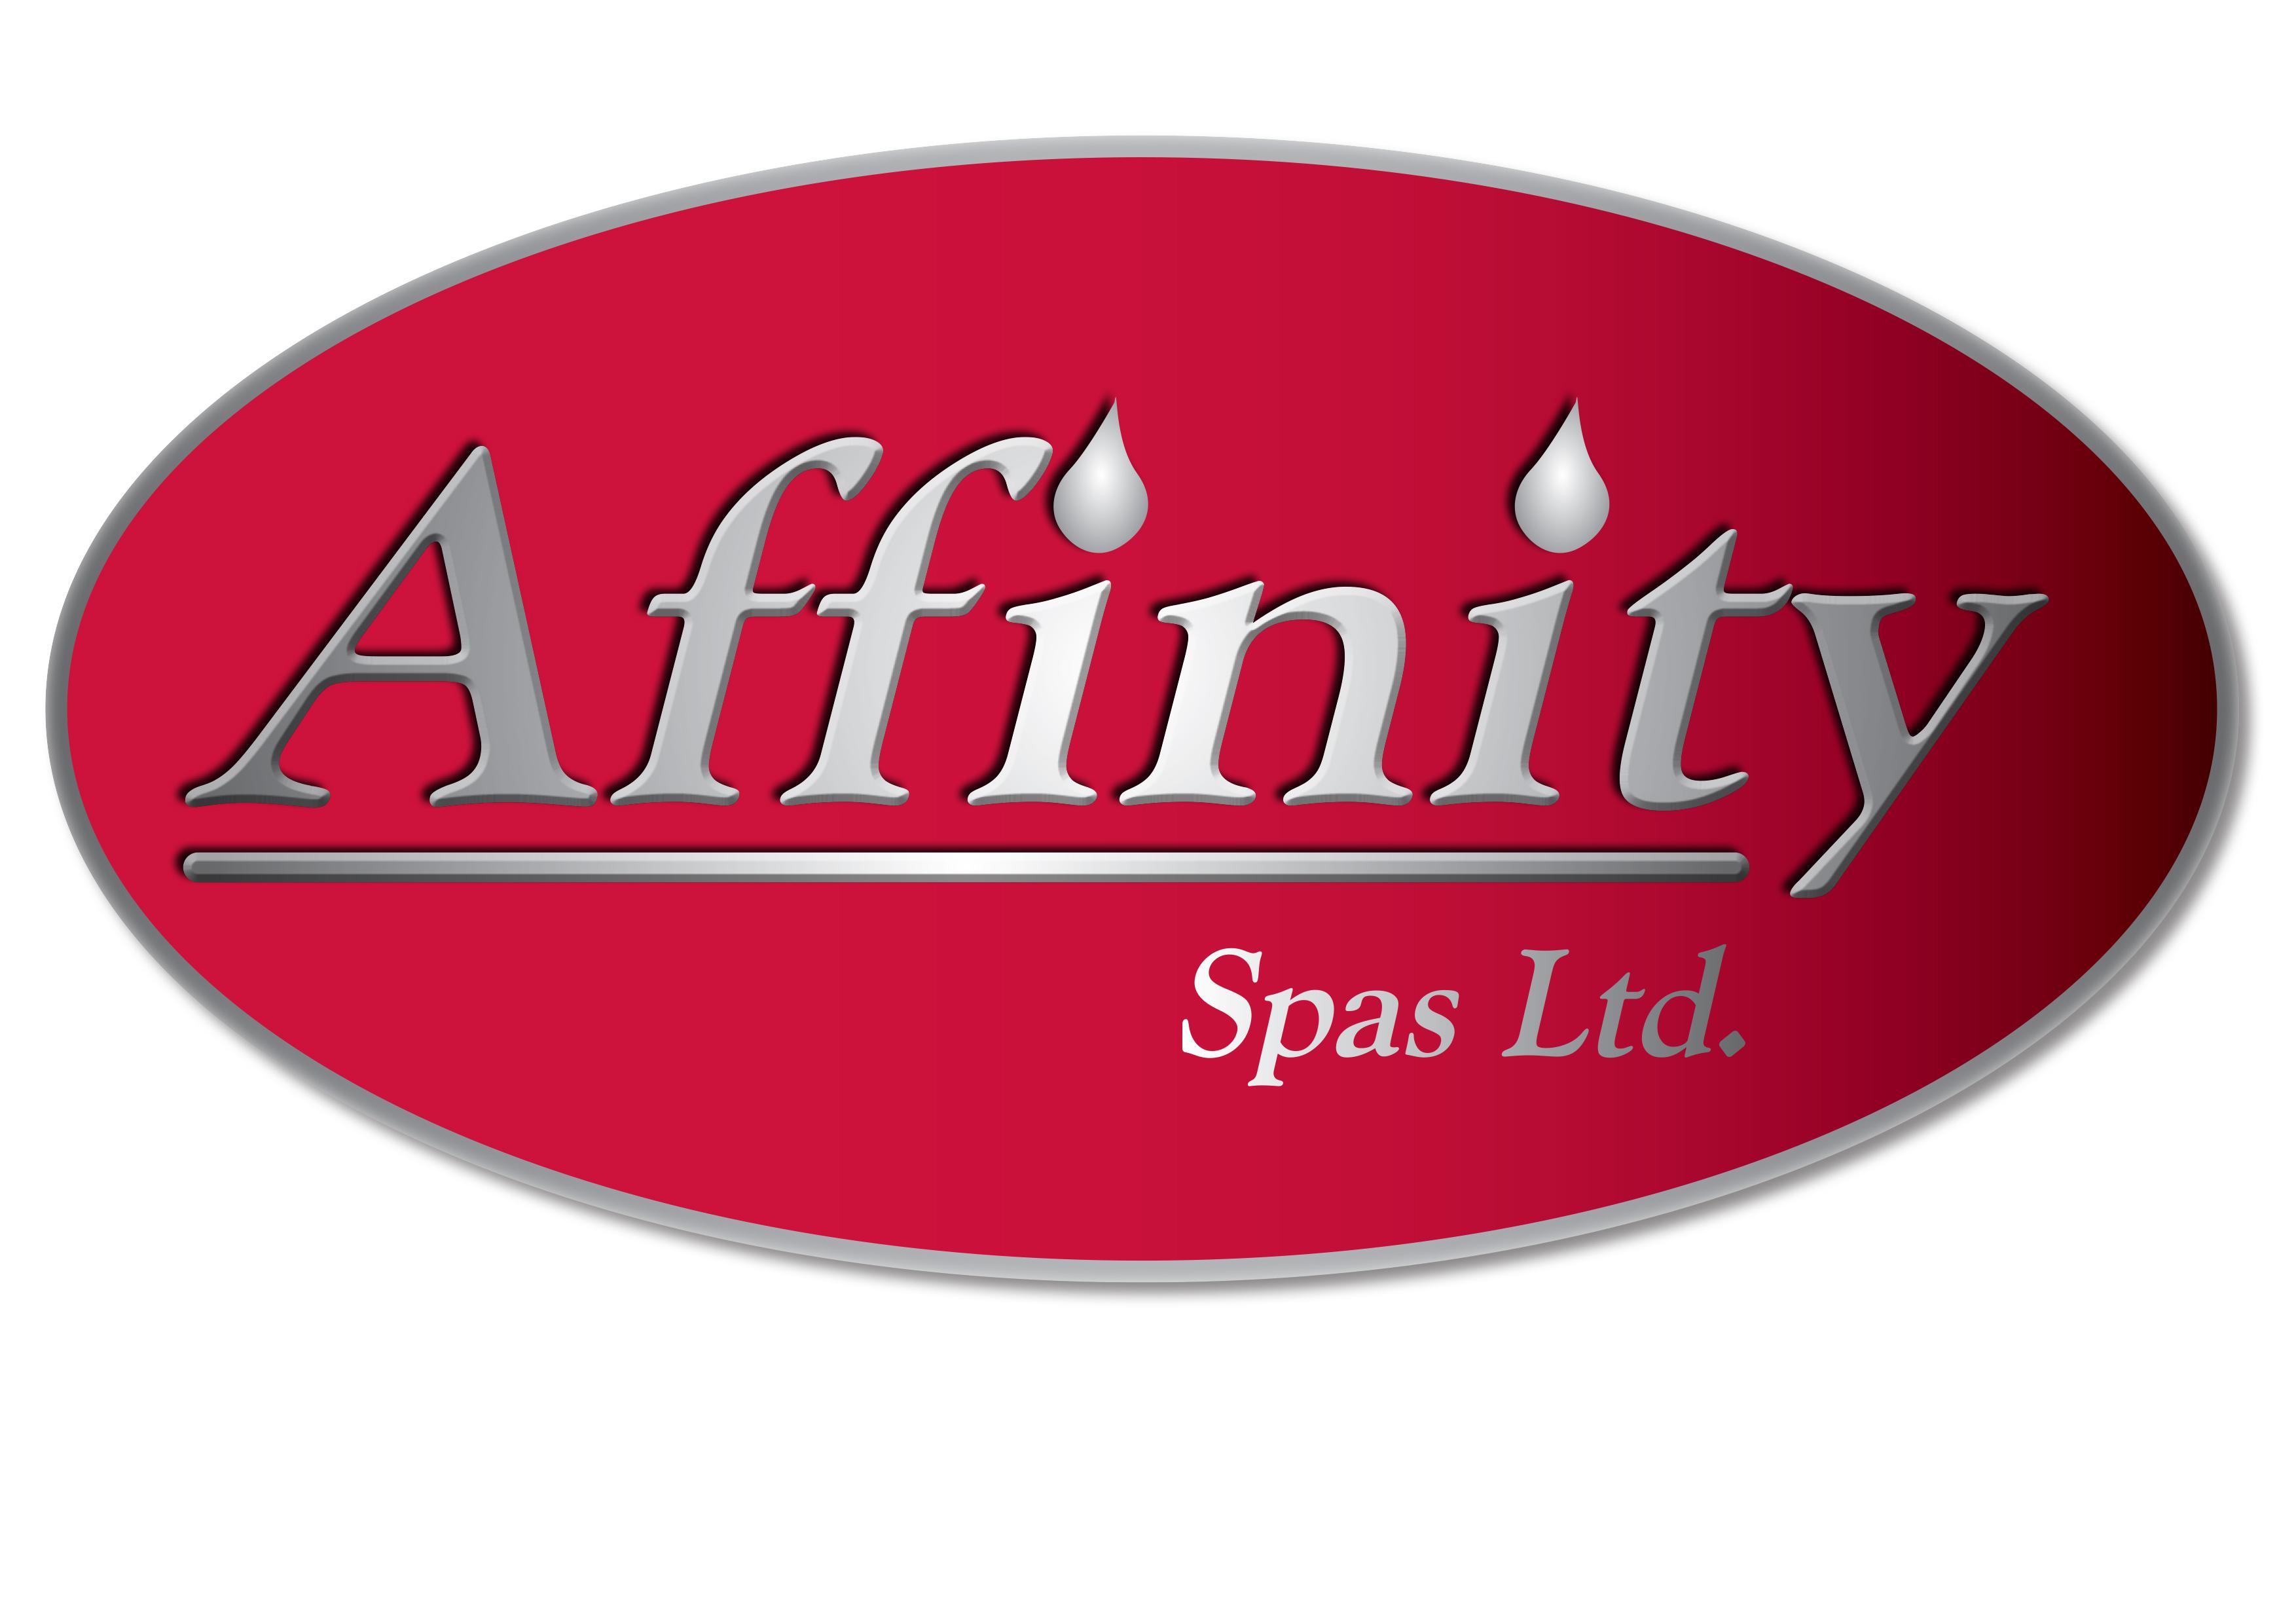 Affinity Spas